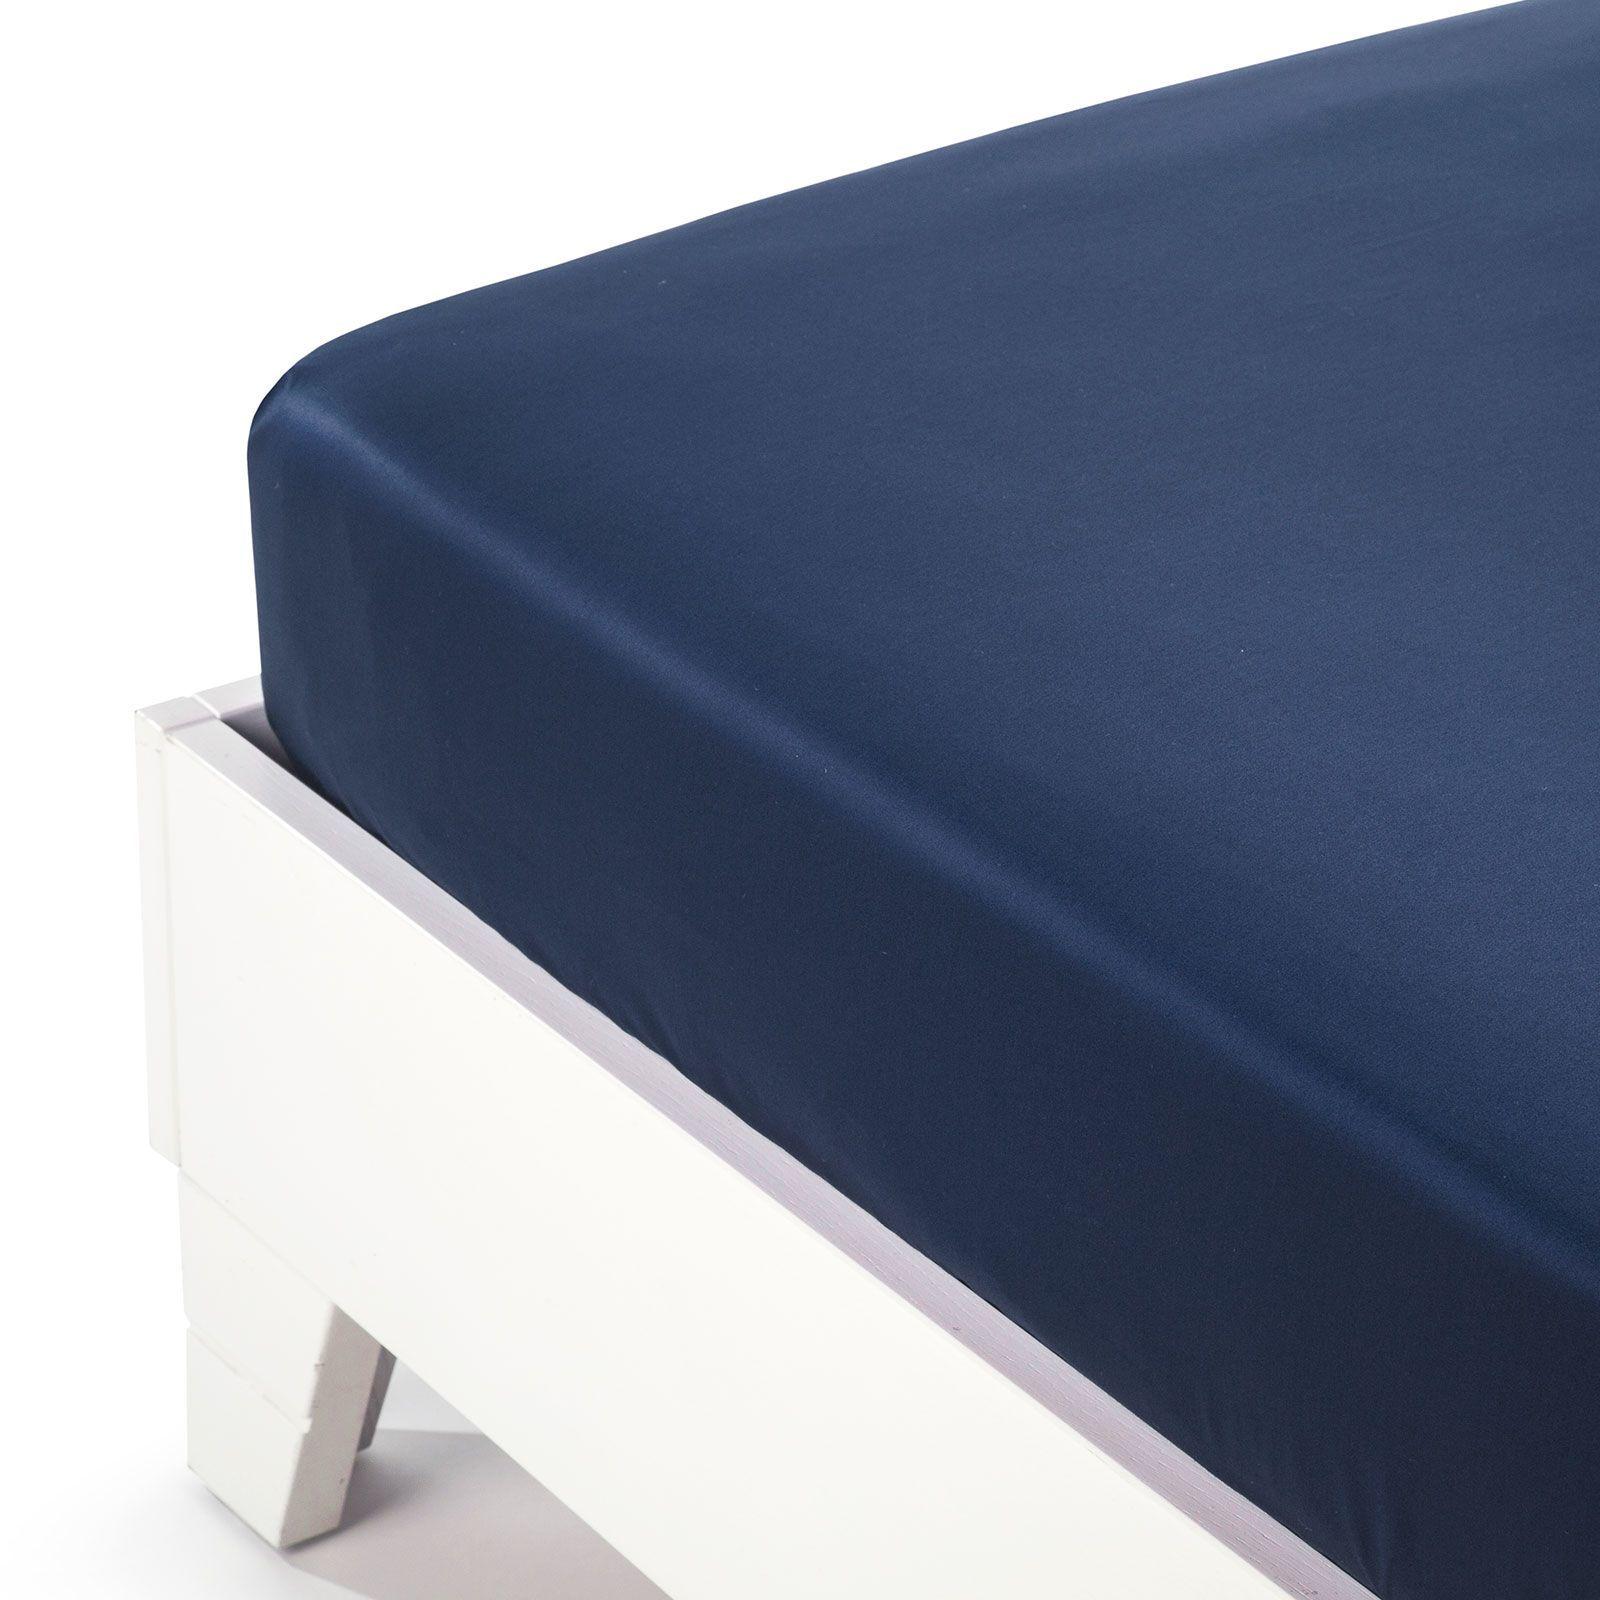 180x200 aleffi raso tinta unito. Black Bedroom Furniture Sets. Home Design Ideas